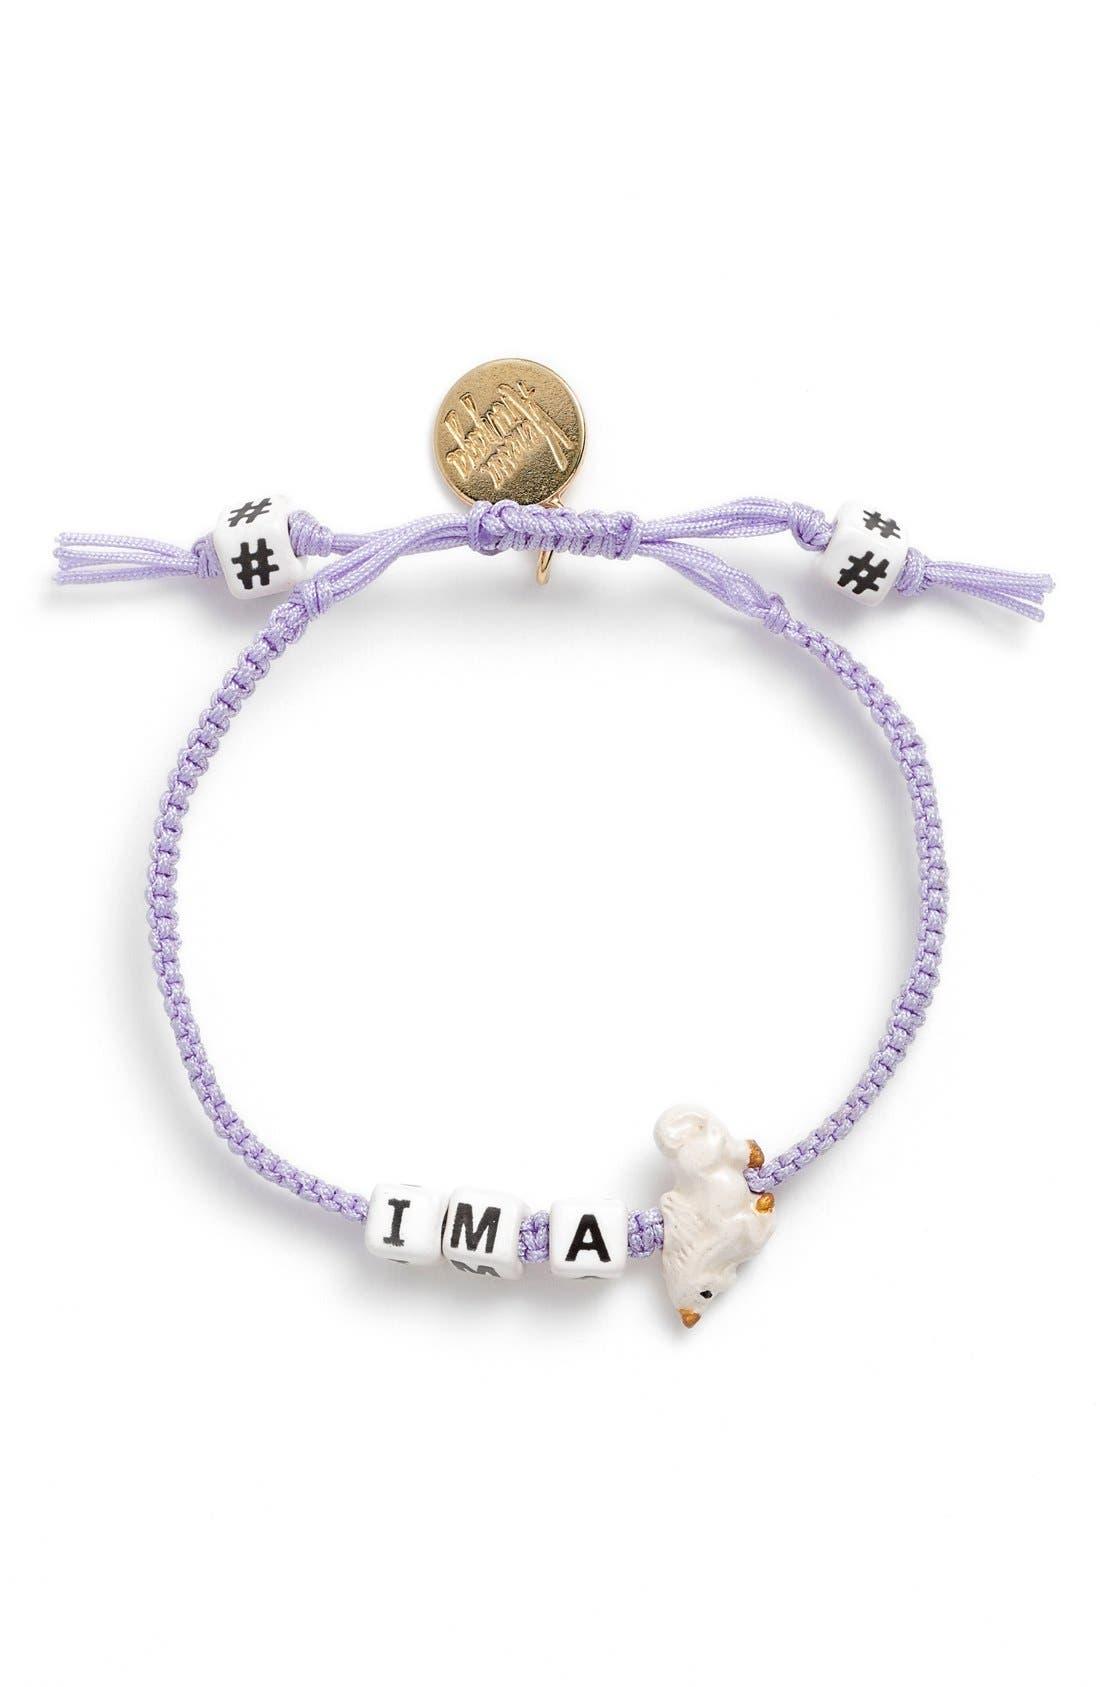 Alternate Image 1 Selected - Venessa Arizaga 'I'm a Unicorn' Bracelet